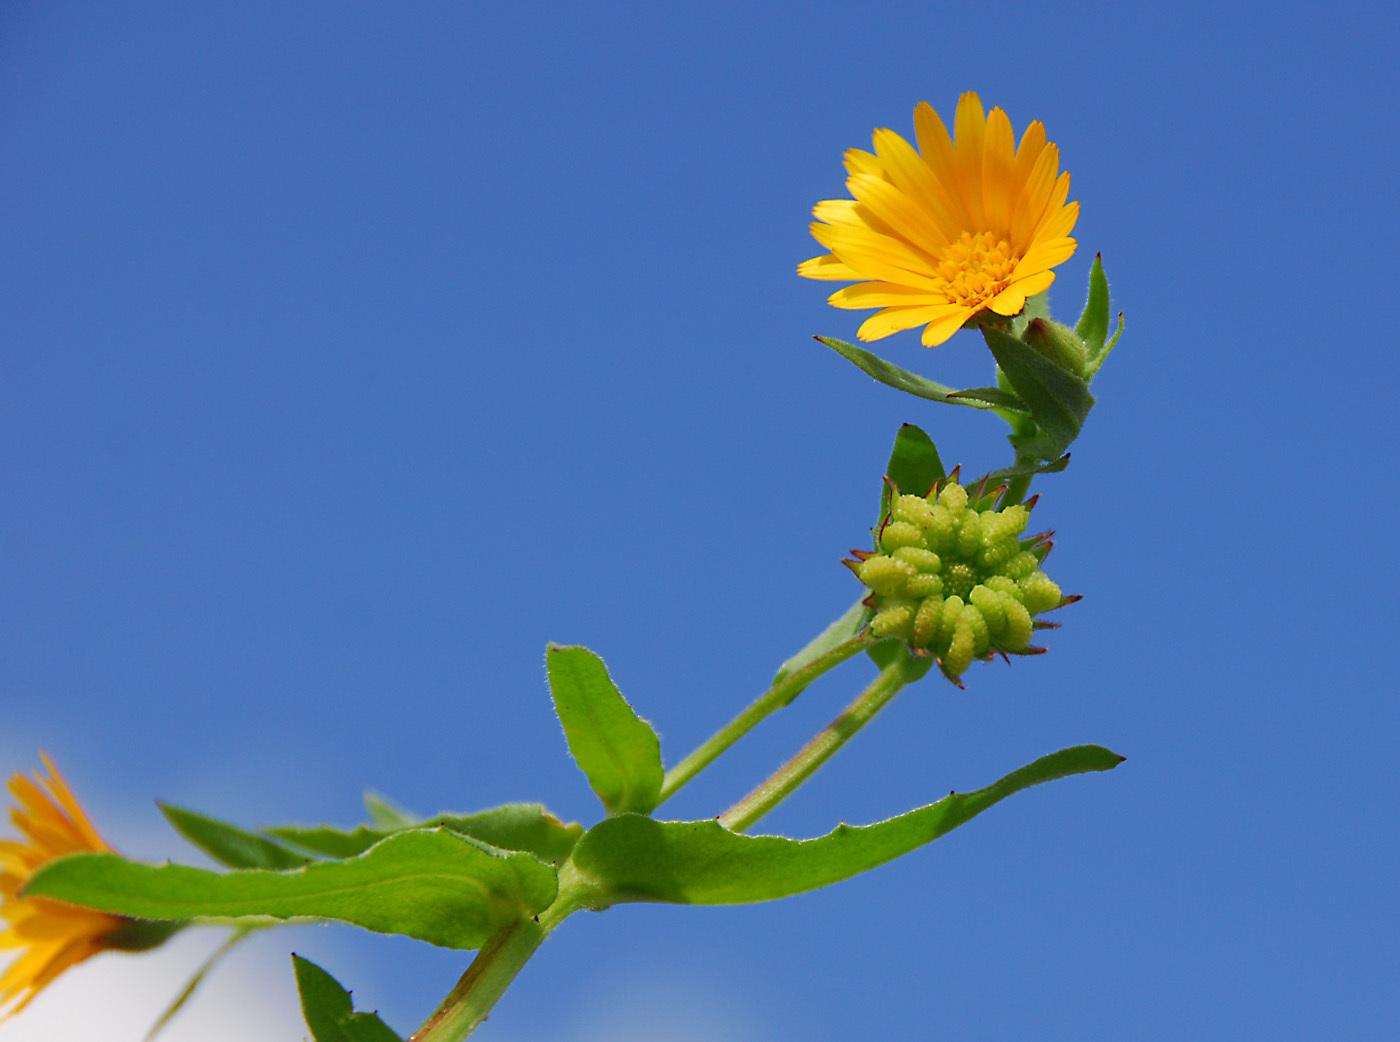 https://pictures.bgbm.org/digilib/Scaler?fn=Cyprus/Calendula_arvensis_B2.jpg&mo=file